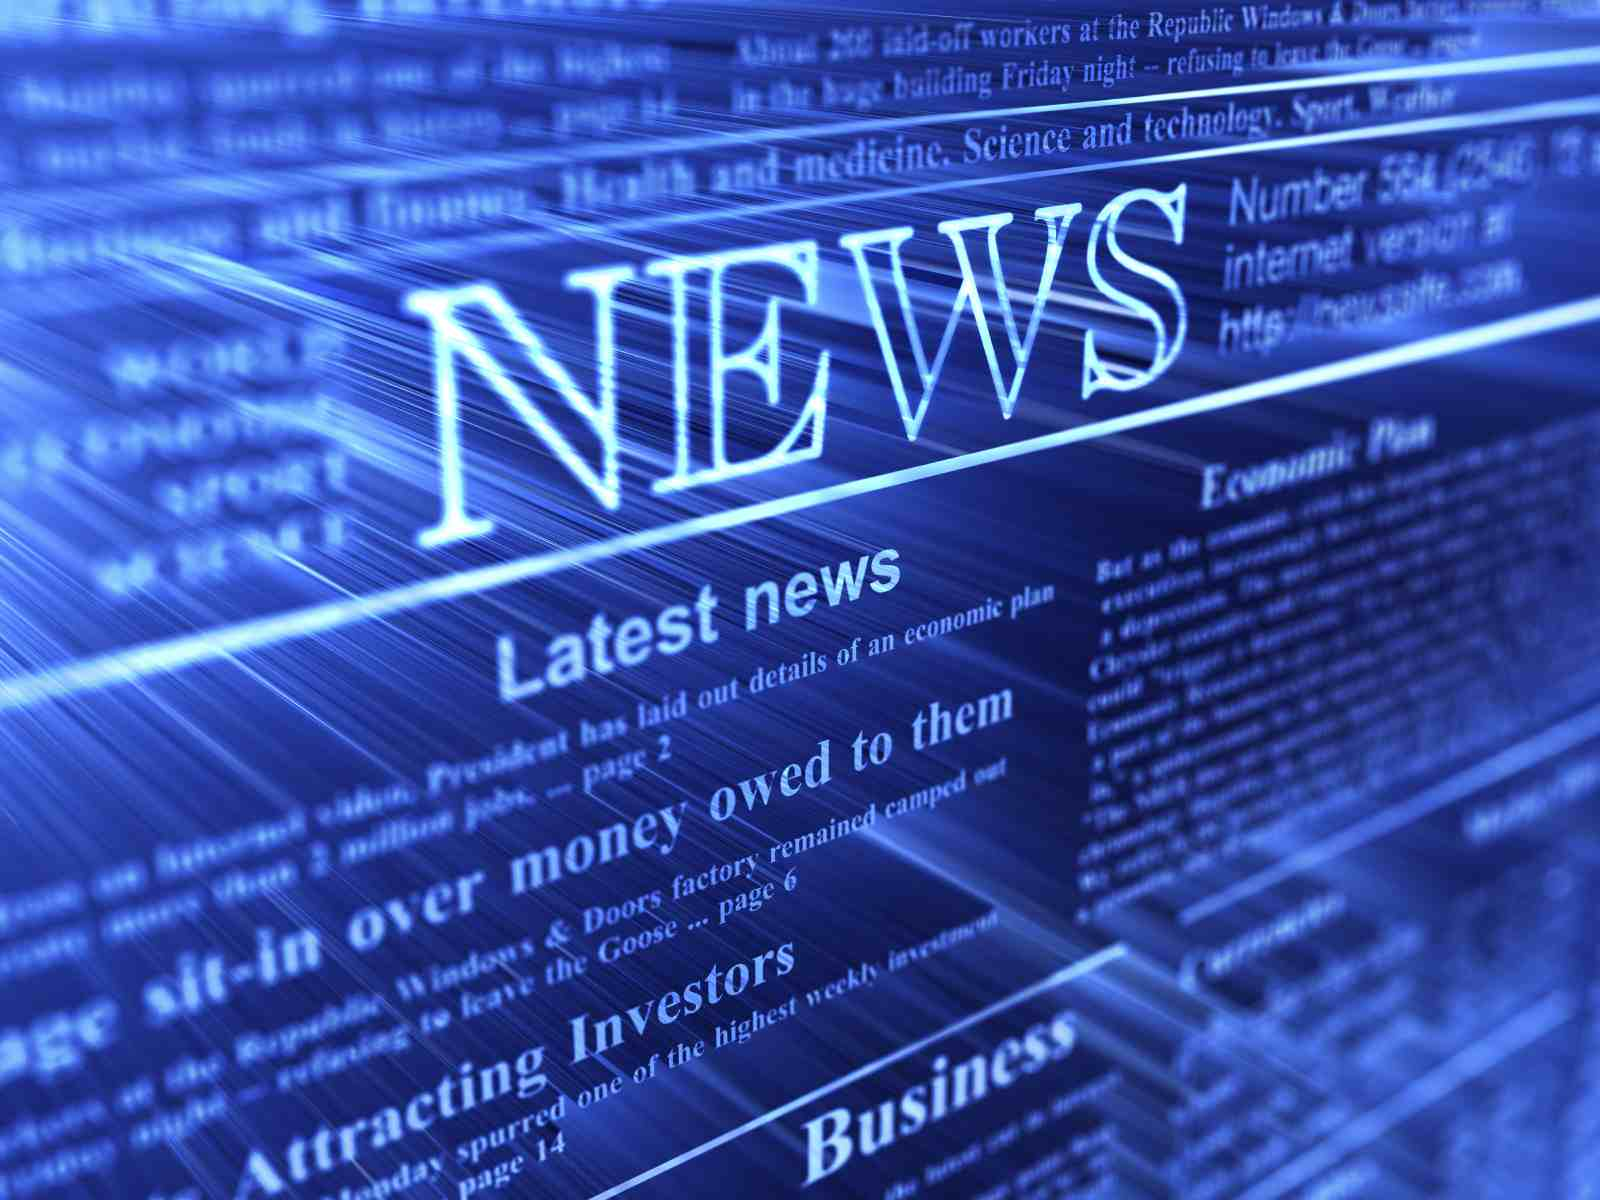 modern media information or propaganda 2015 tech